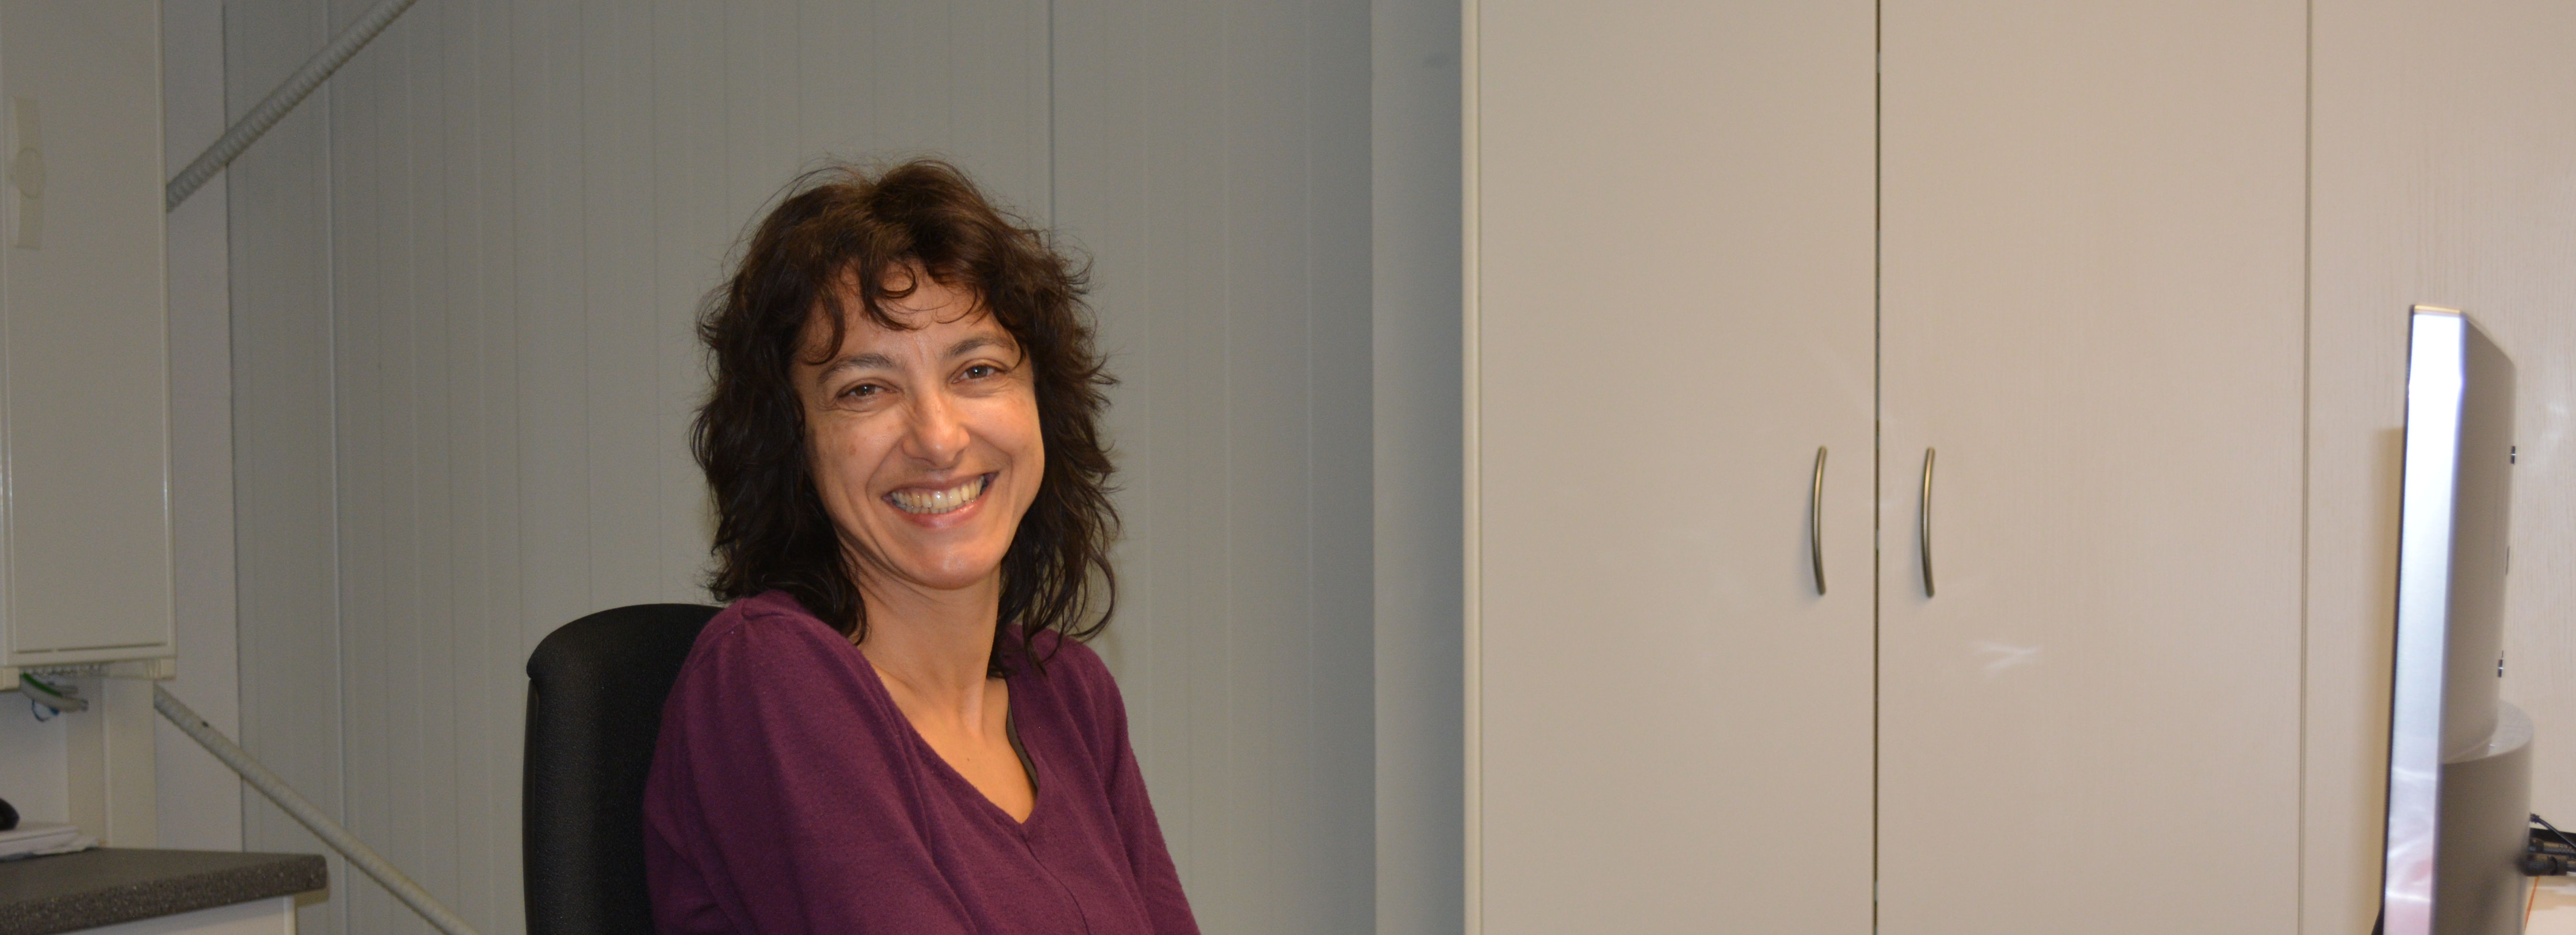 Barbara Staub, Administration